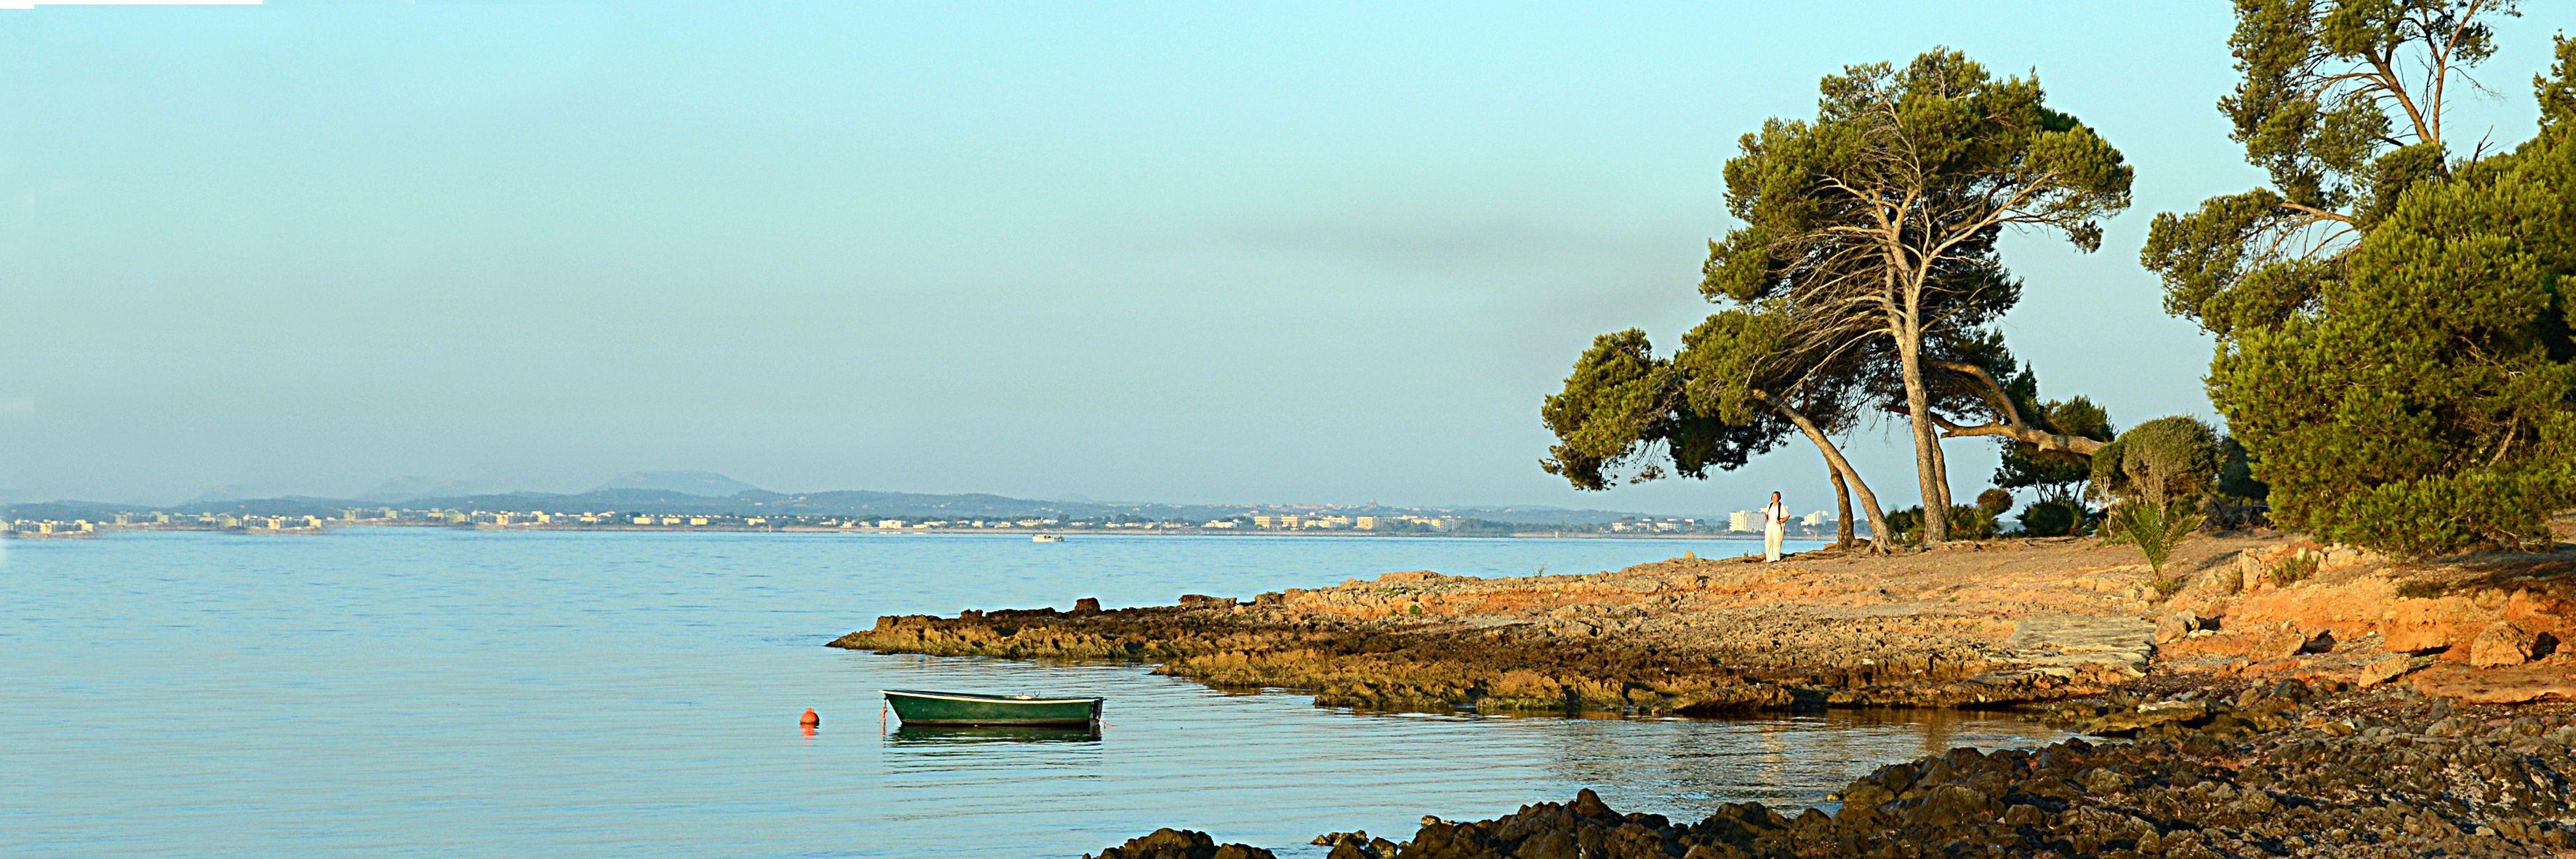 Mallorca Alcanada morning sea Майорка Альканада утро